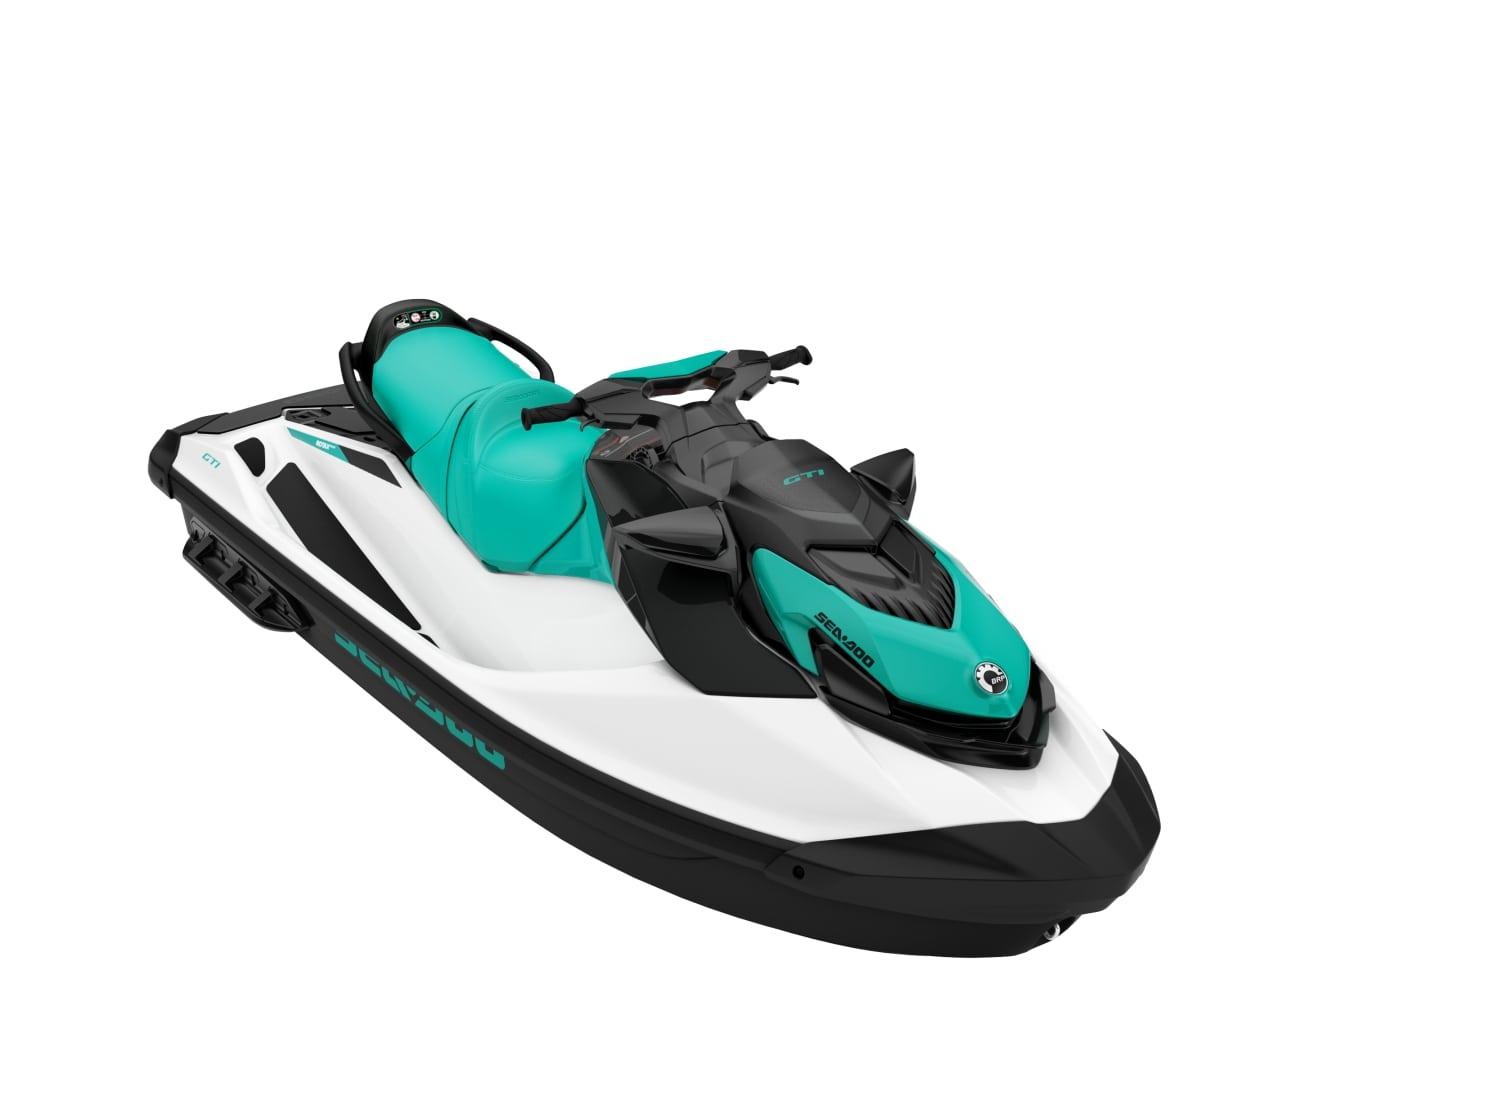 2021 - GTI STD 130 BRP SEADOO ( COLORE: WHITE &REEF BLUE)